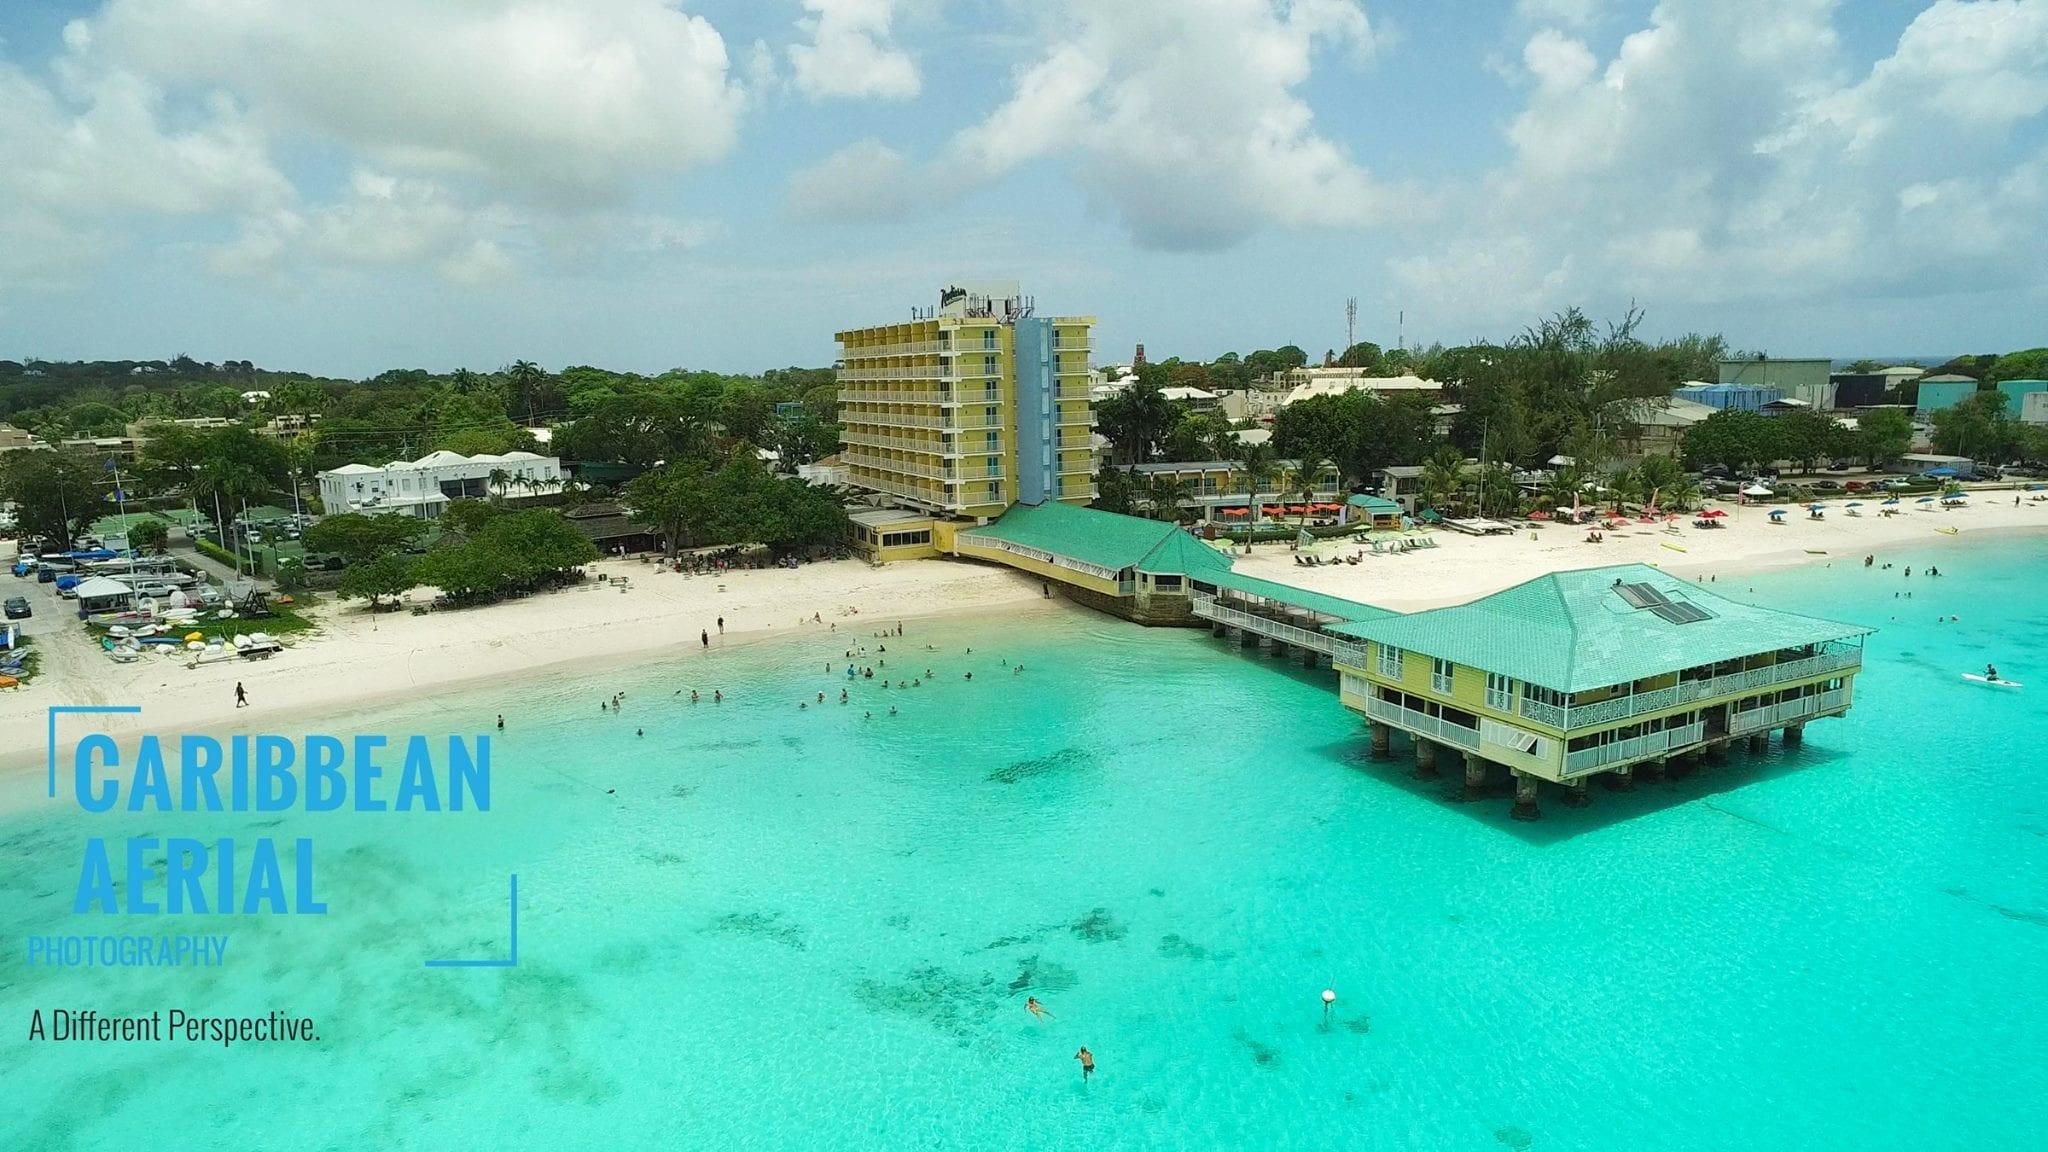 caribbean-aerial-photography-028